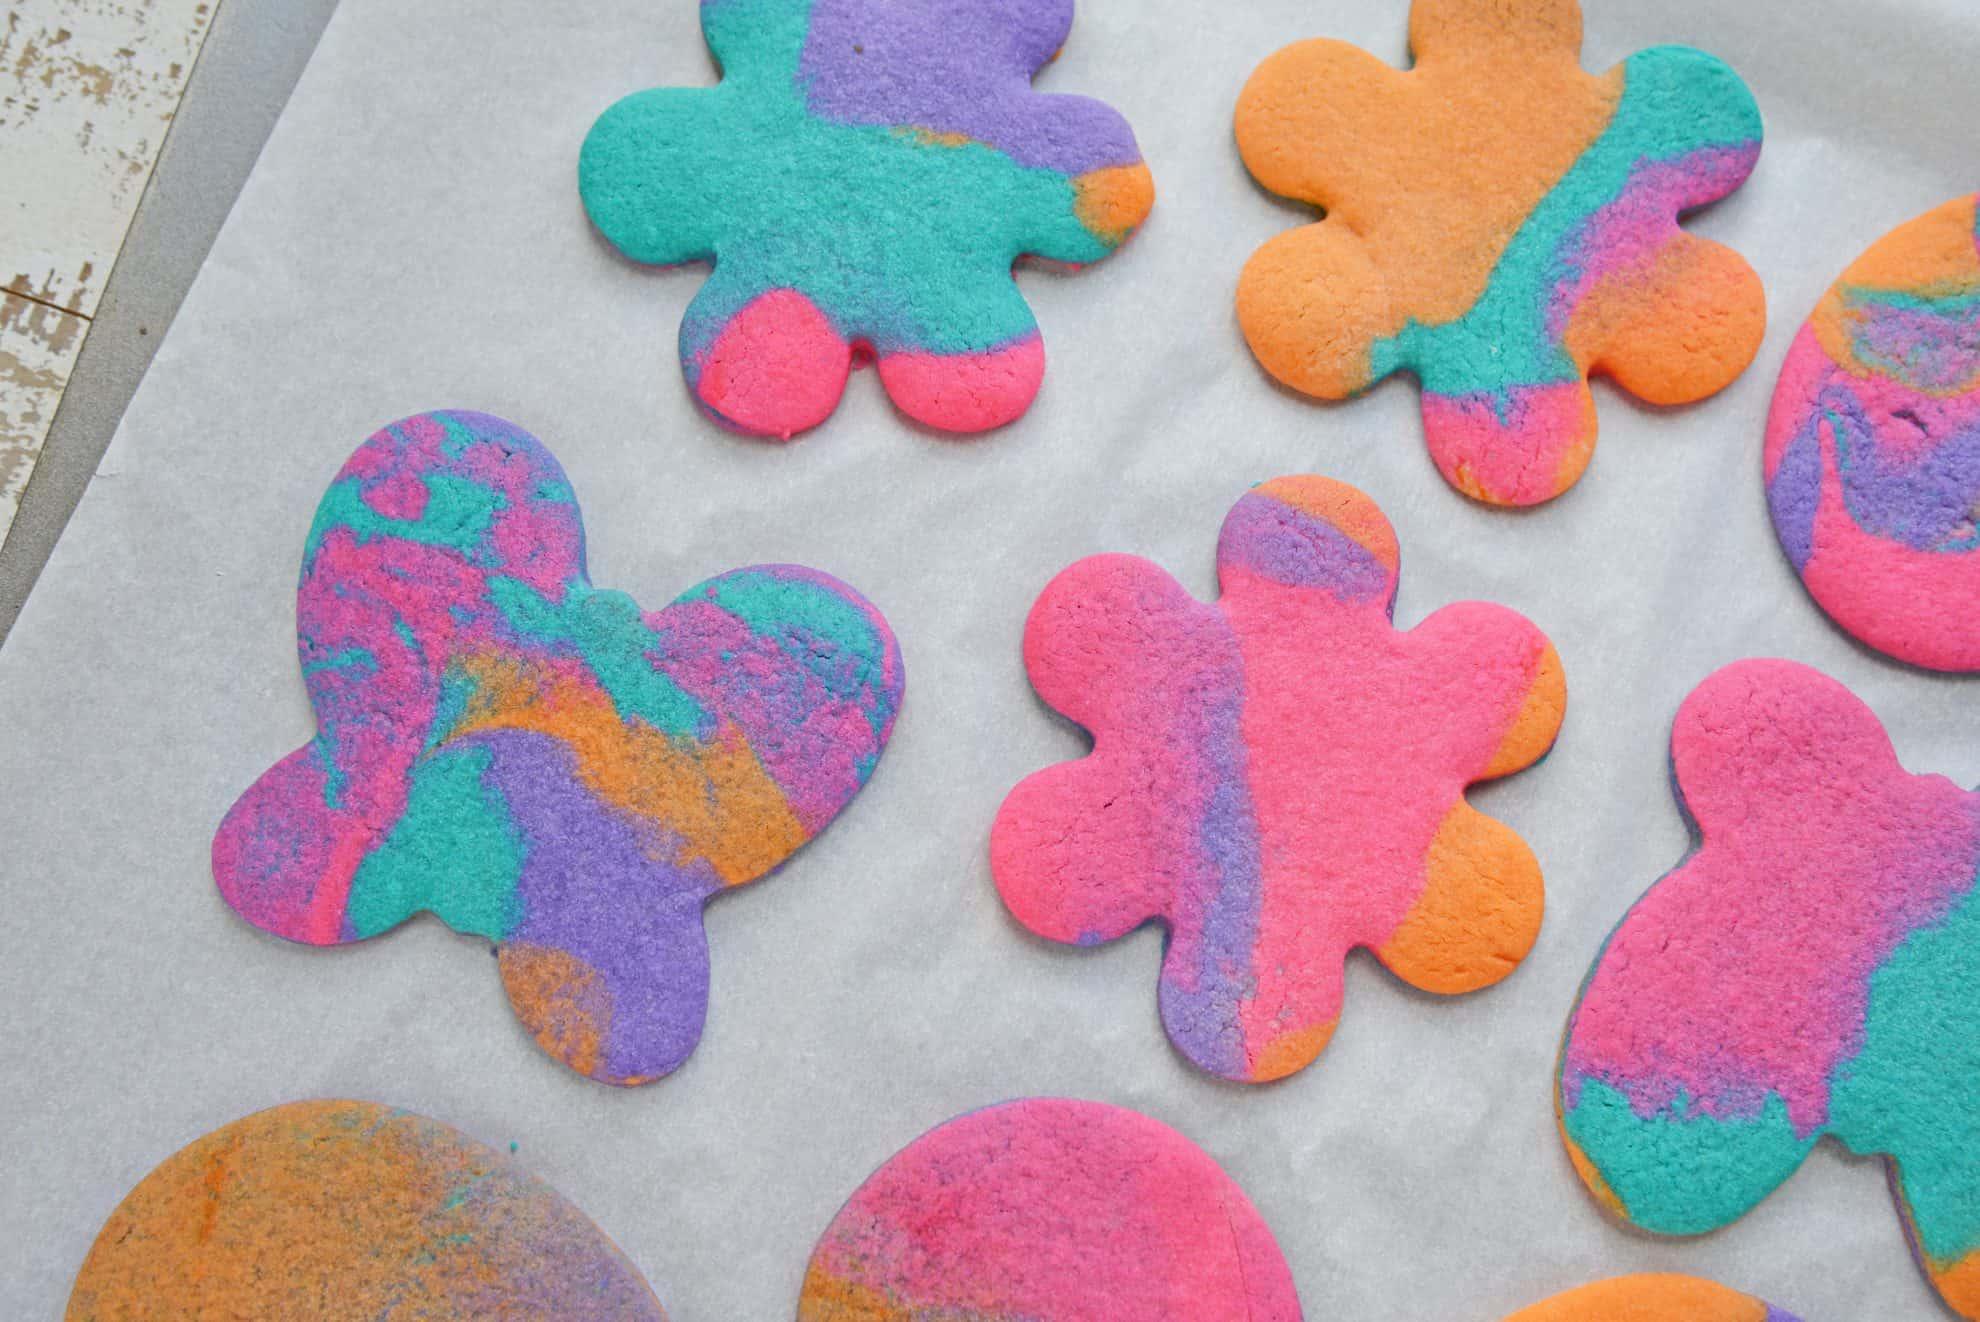 Tie Dye Sugar Cookies on baking sheet